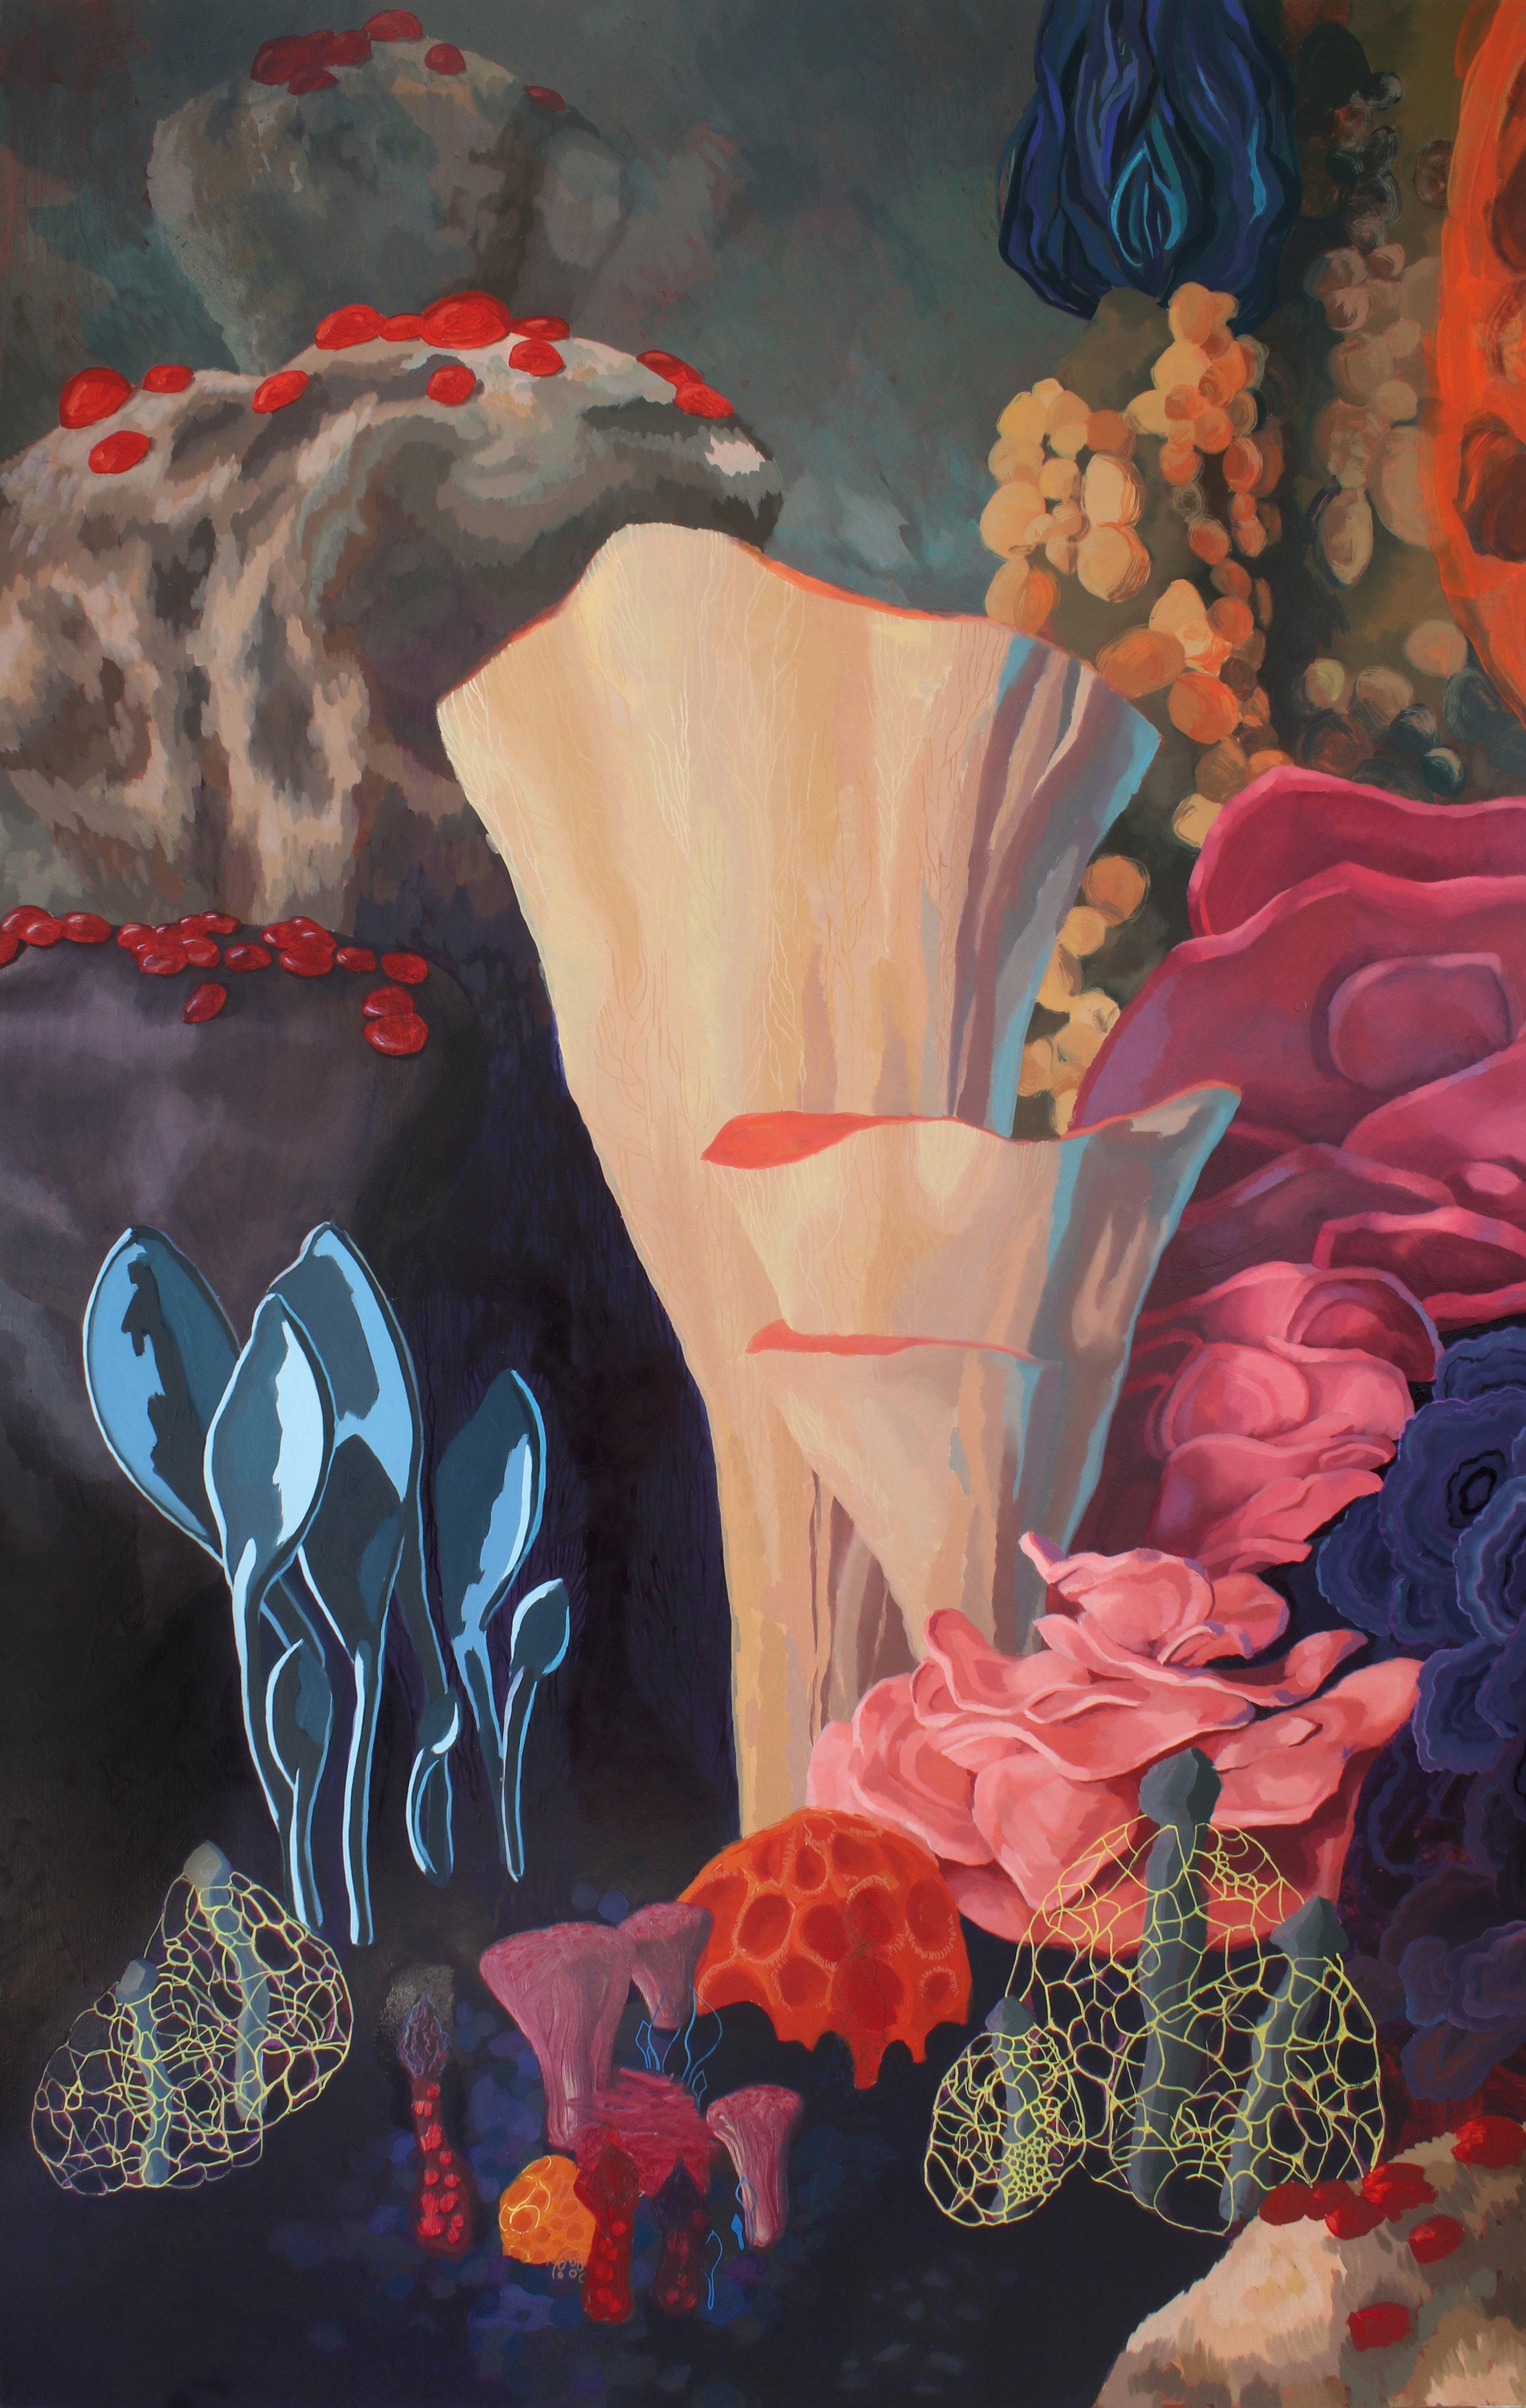 Mycelium  -2018 - Acrylic, oil and pen on woodpanels Diptych, 110 x 170 cm